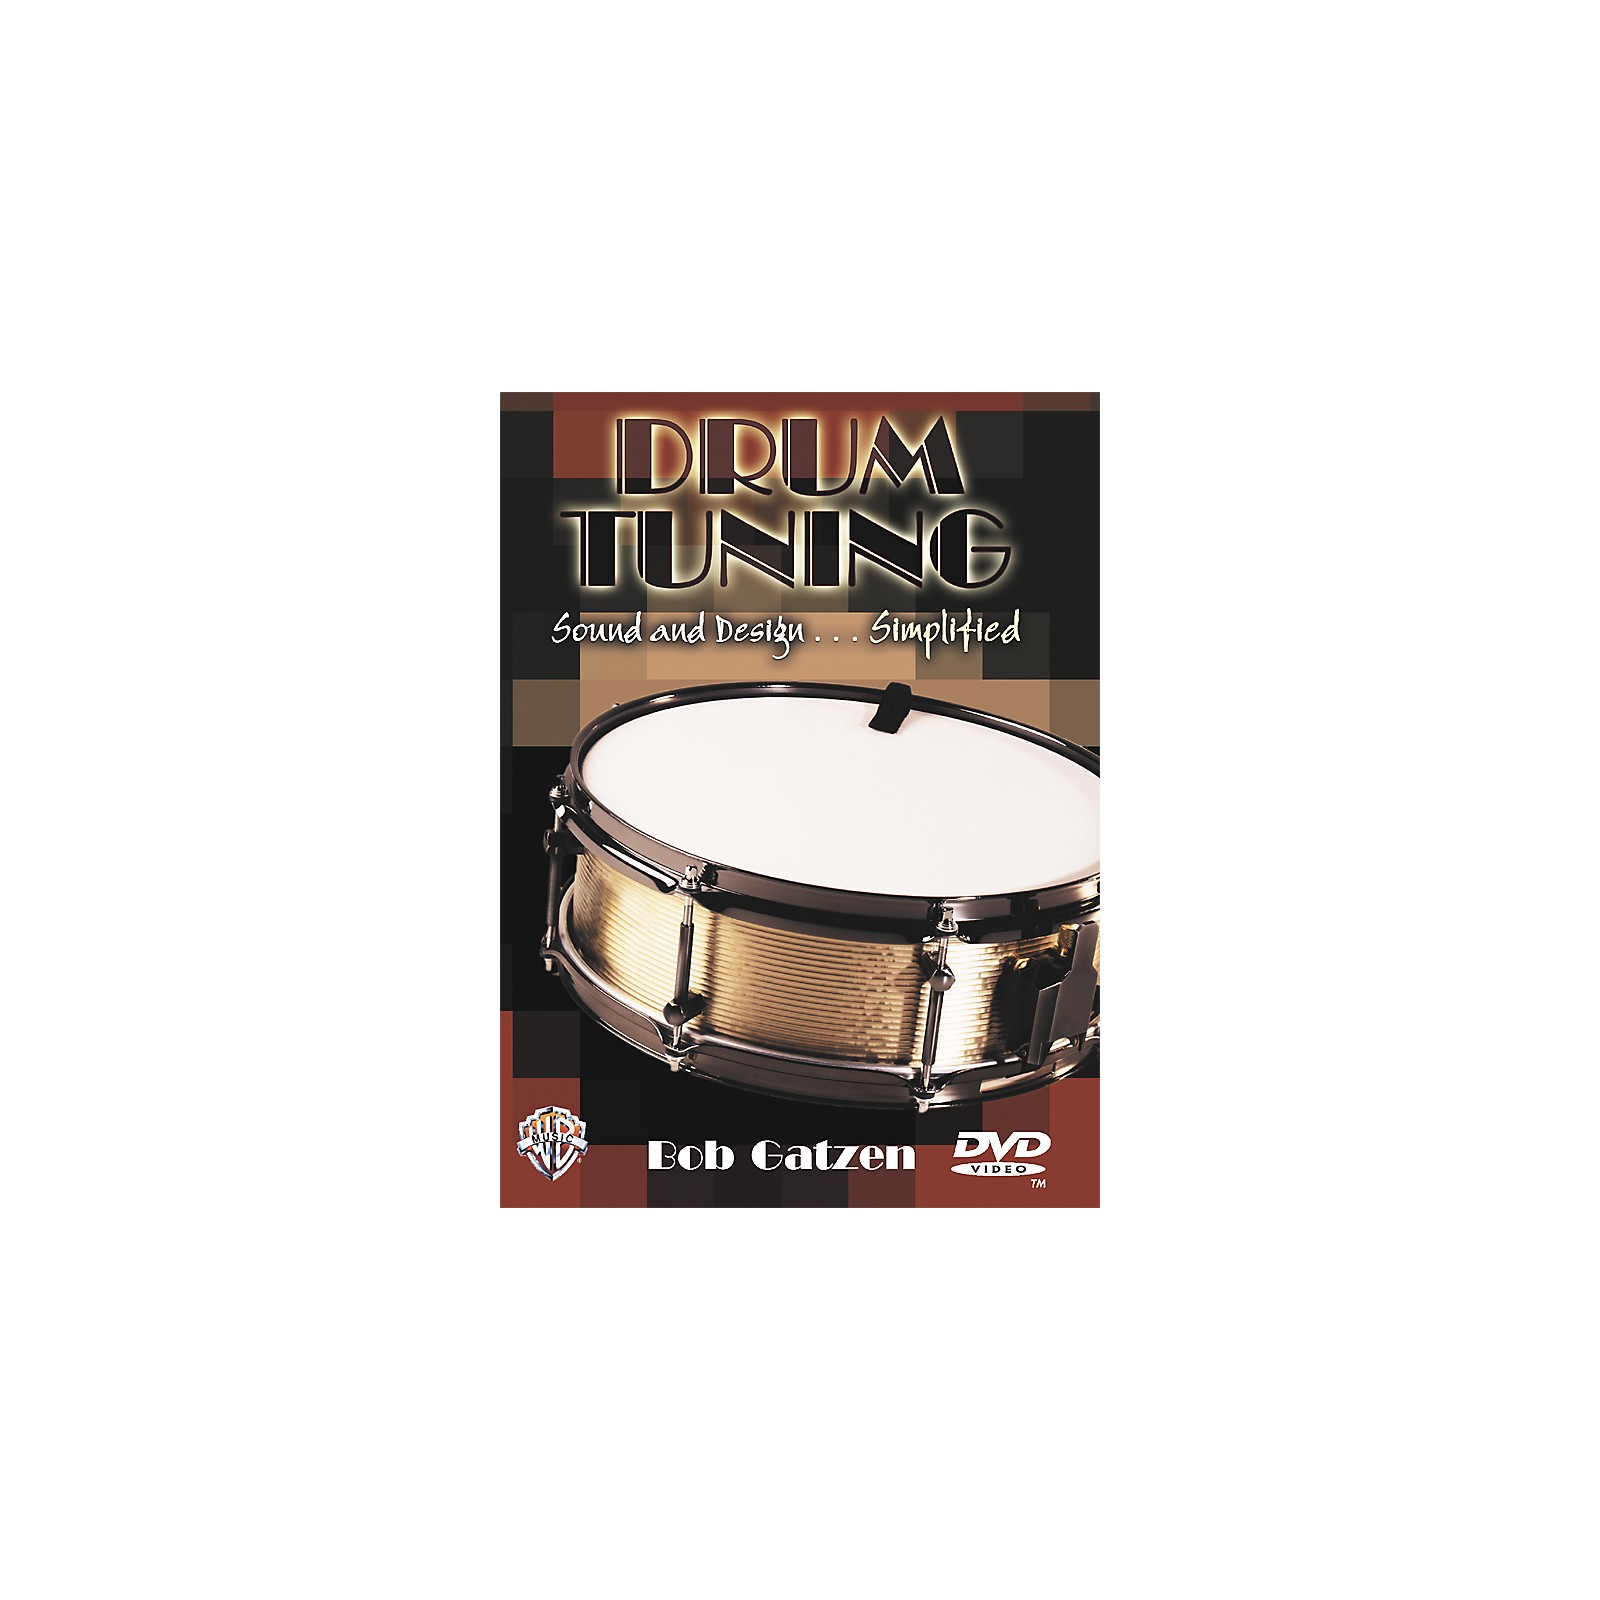 Warner Bros Drum Tuning - Sound and Design..Simplified DVD